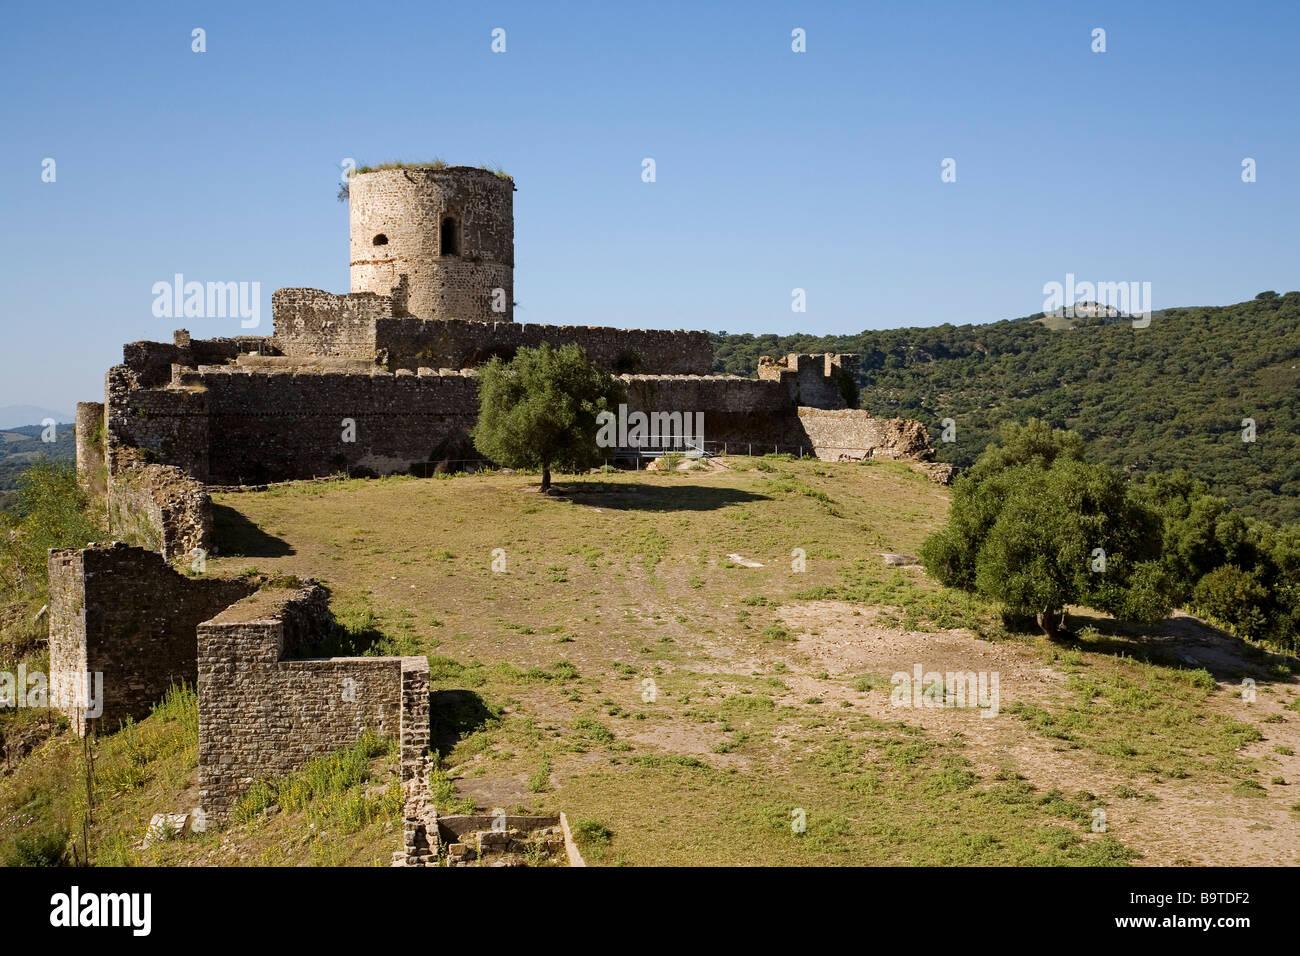 Homenaje Tower Castle of Jimena de la Frontera Cádiz Andalusia Spain Stock Photo